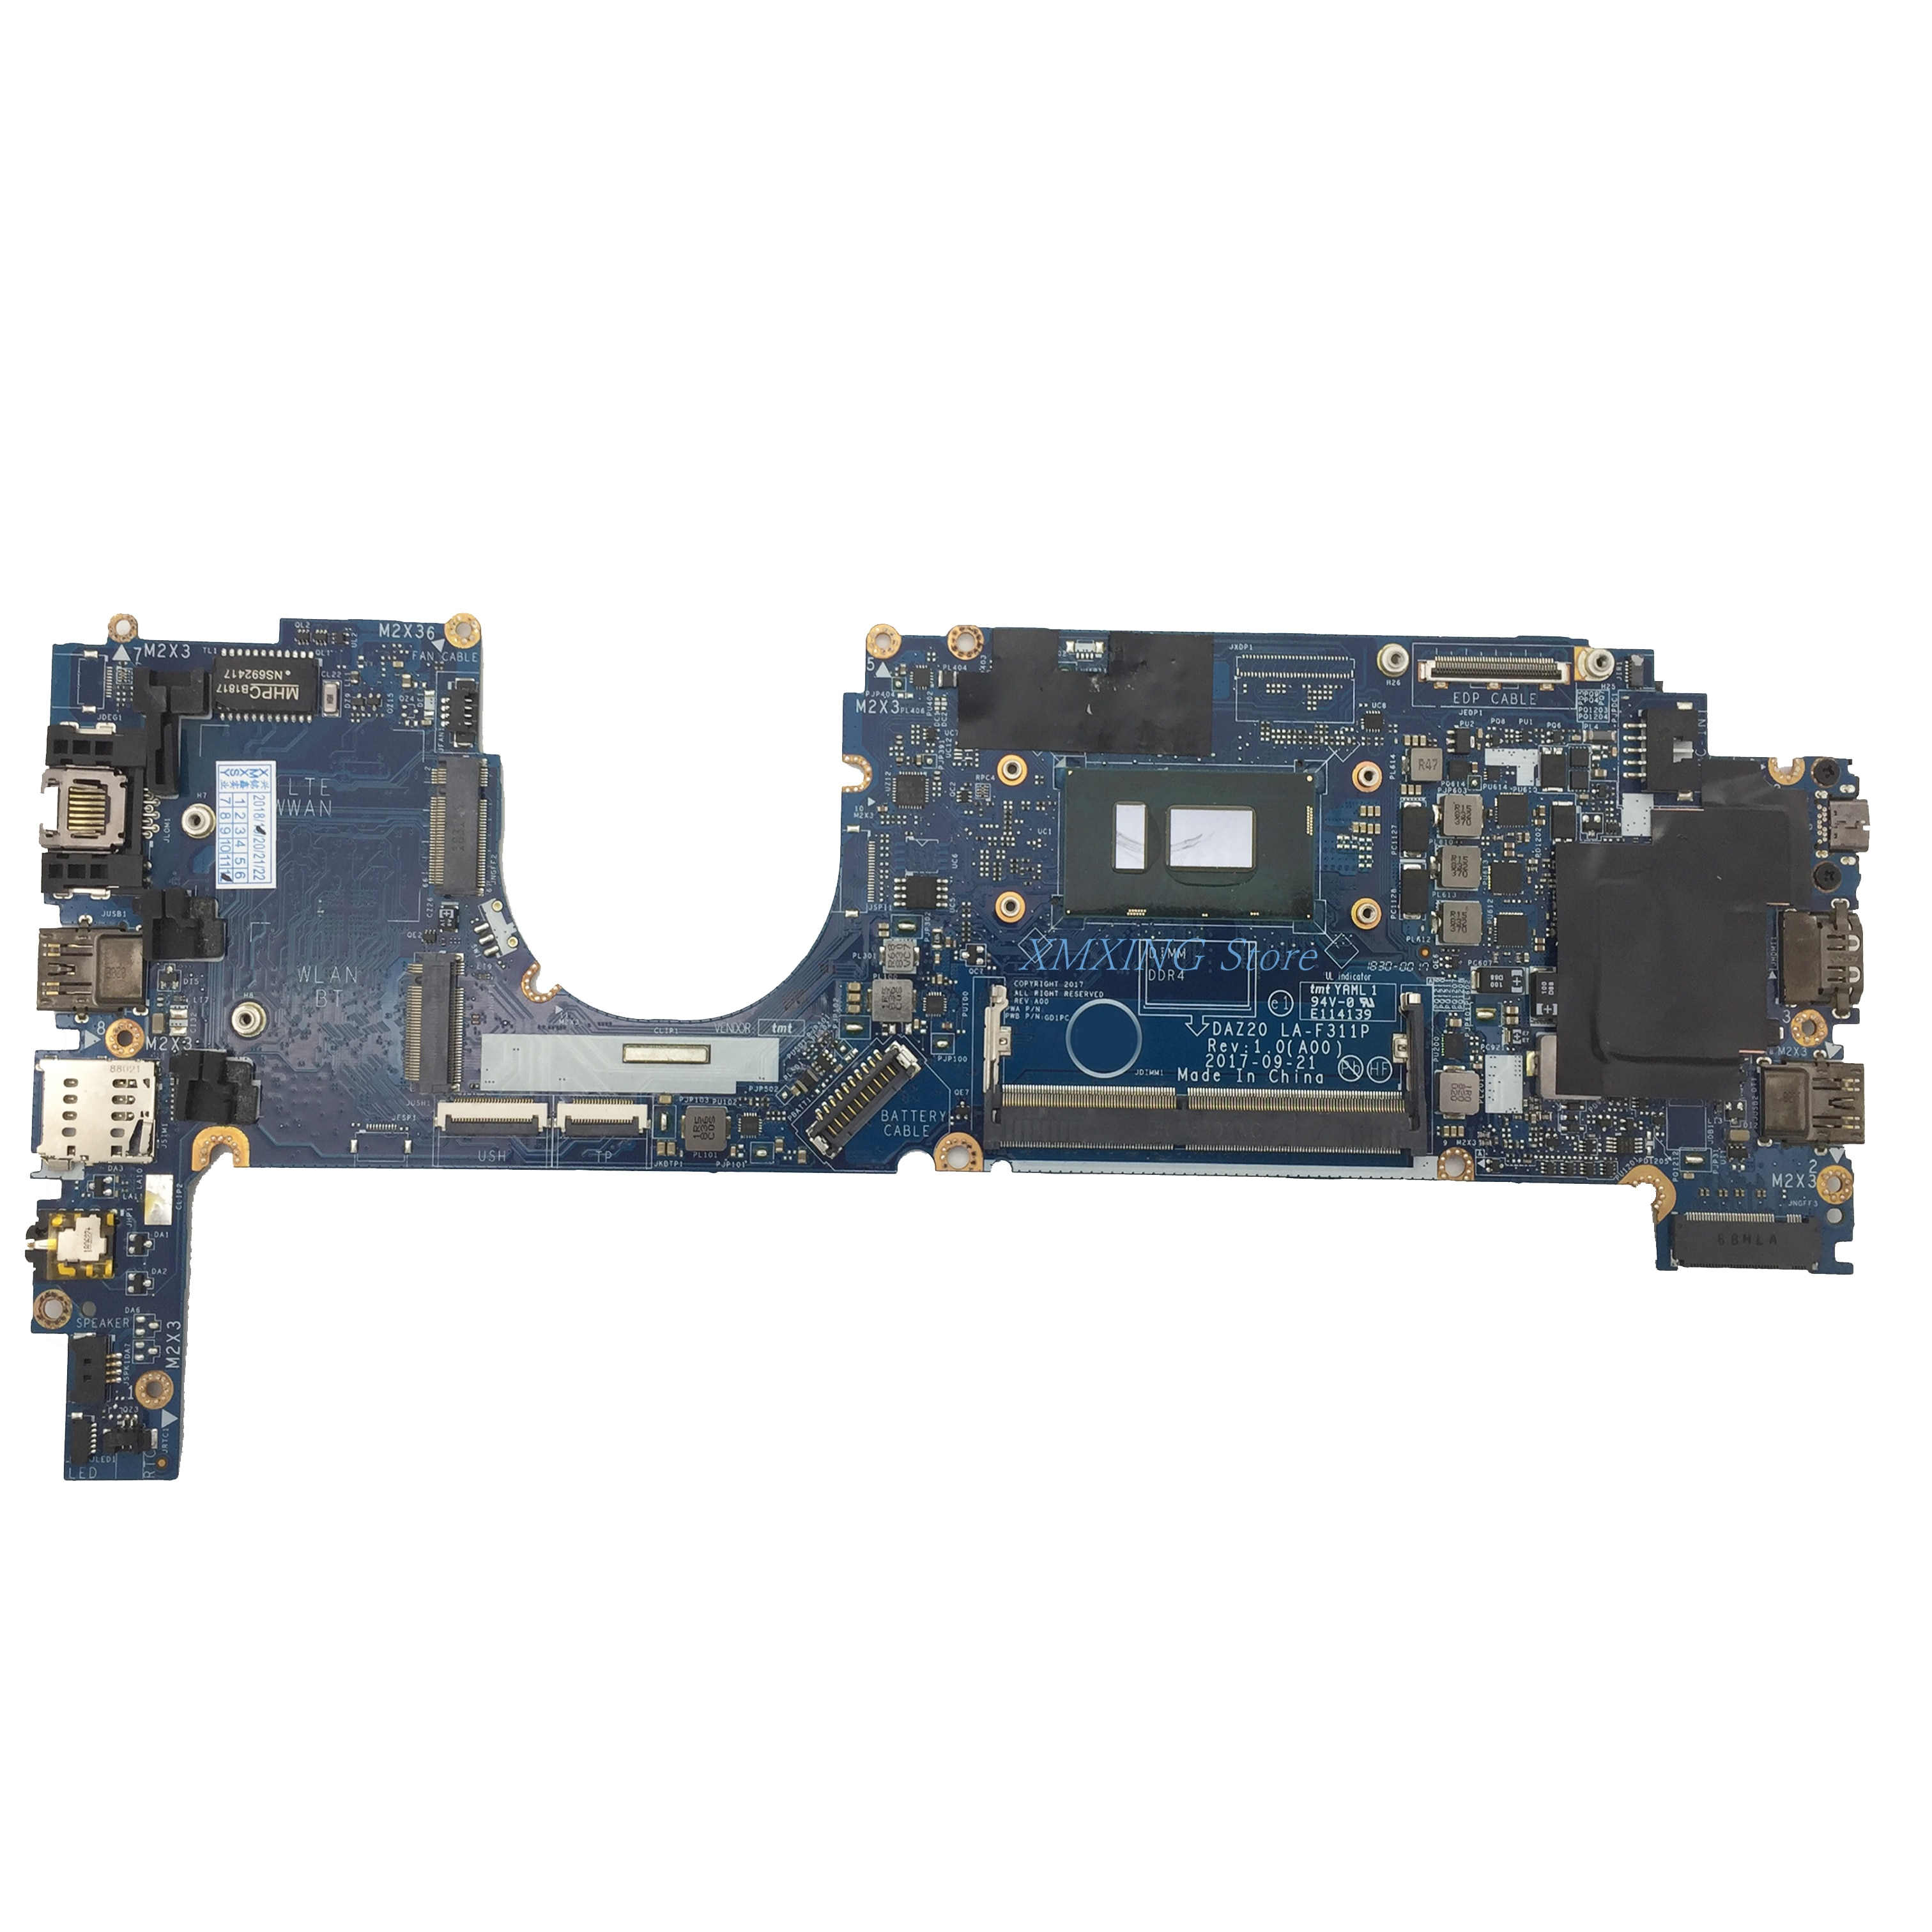 FULCOL لديل خط العرض 7290 7390 اللوحة المحمول I7-8650U CPU LA-F311P CN-0MXW44 0MXW44 MXW44 اختبار 100% العمل